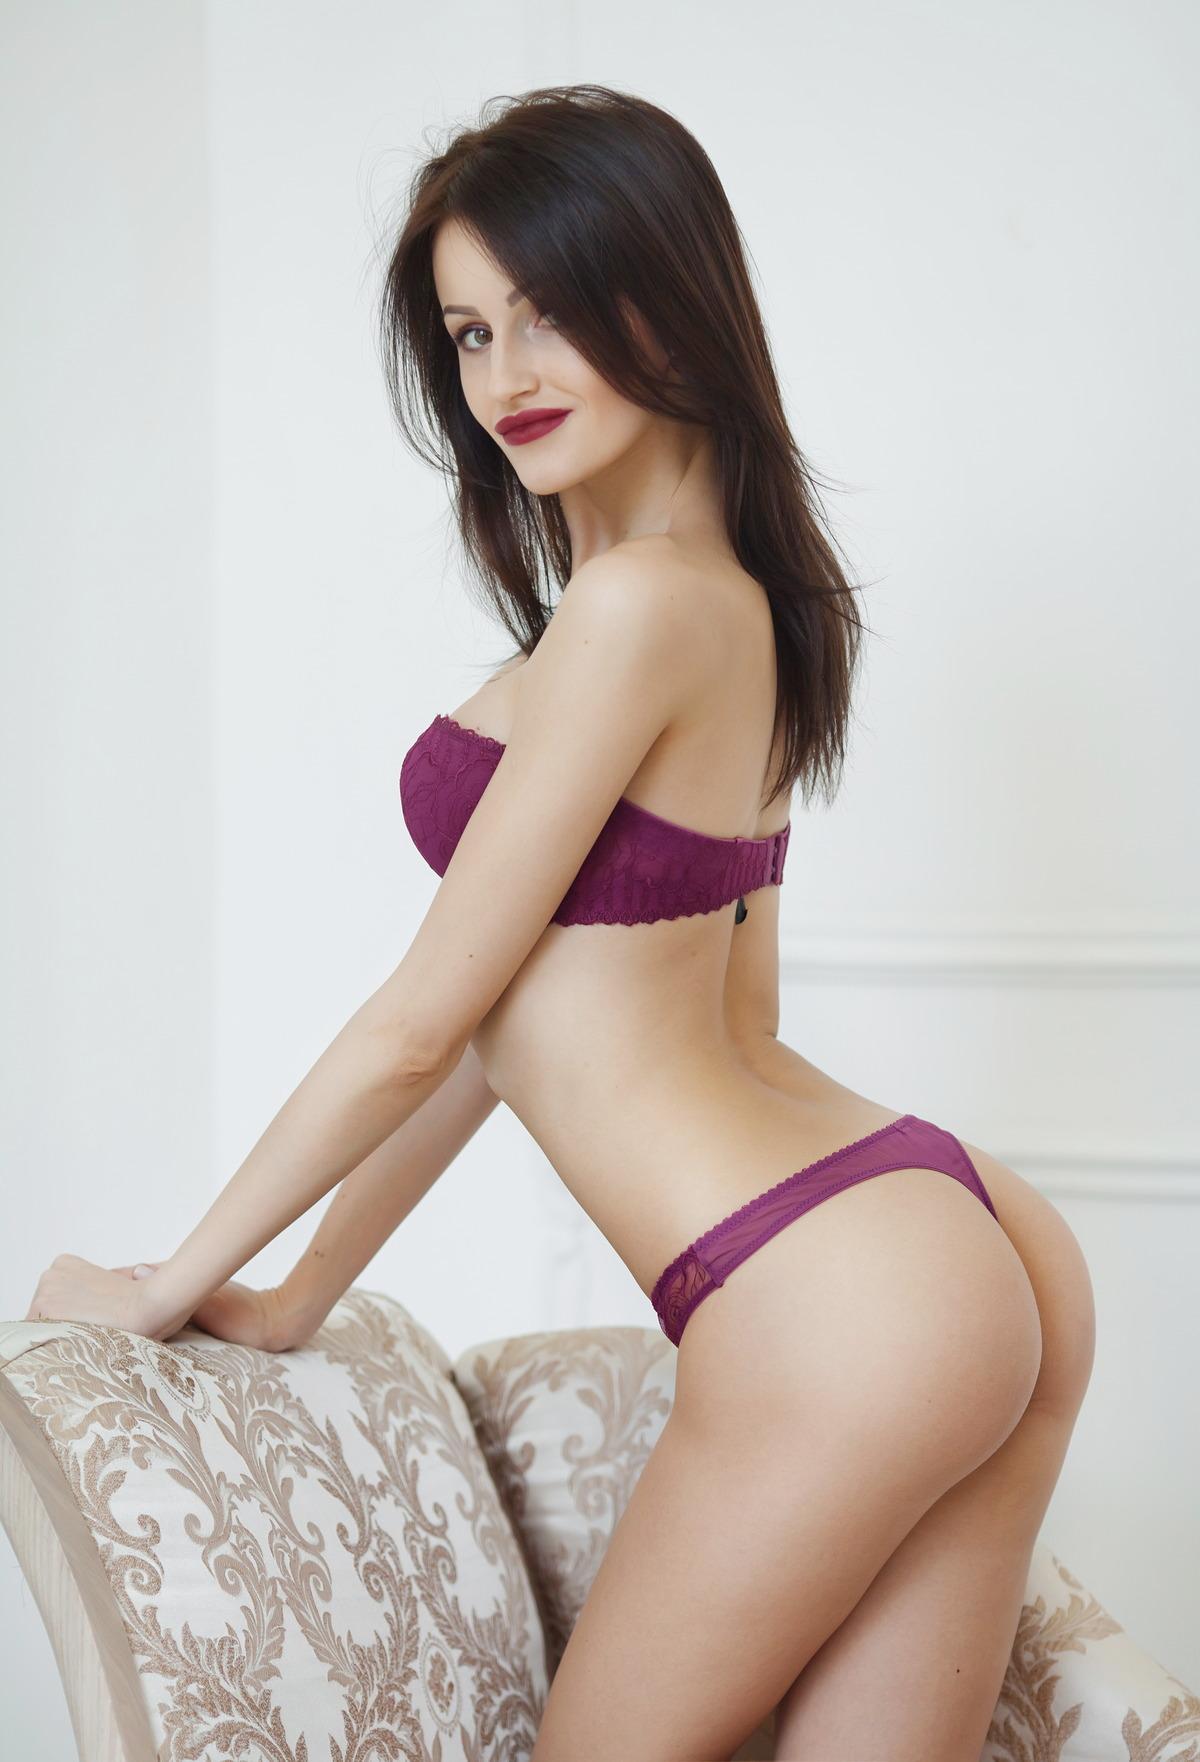 Sexy Girl zeigt Knackpo